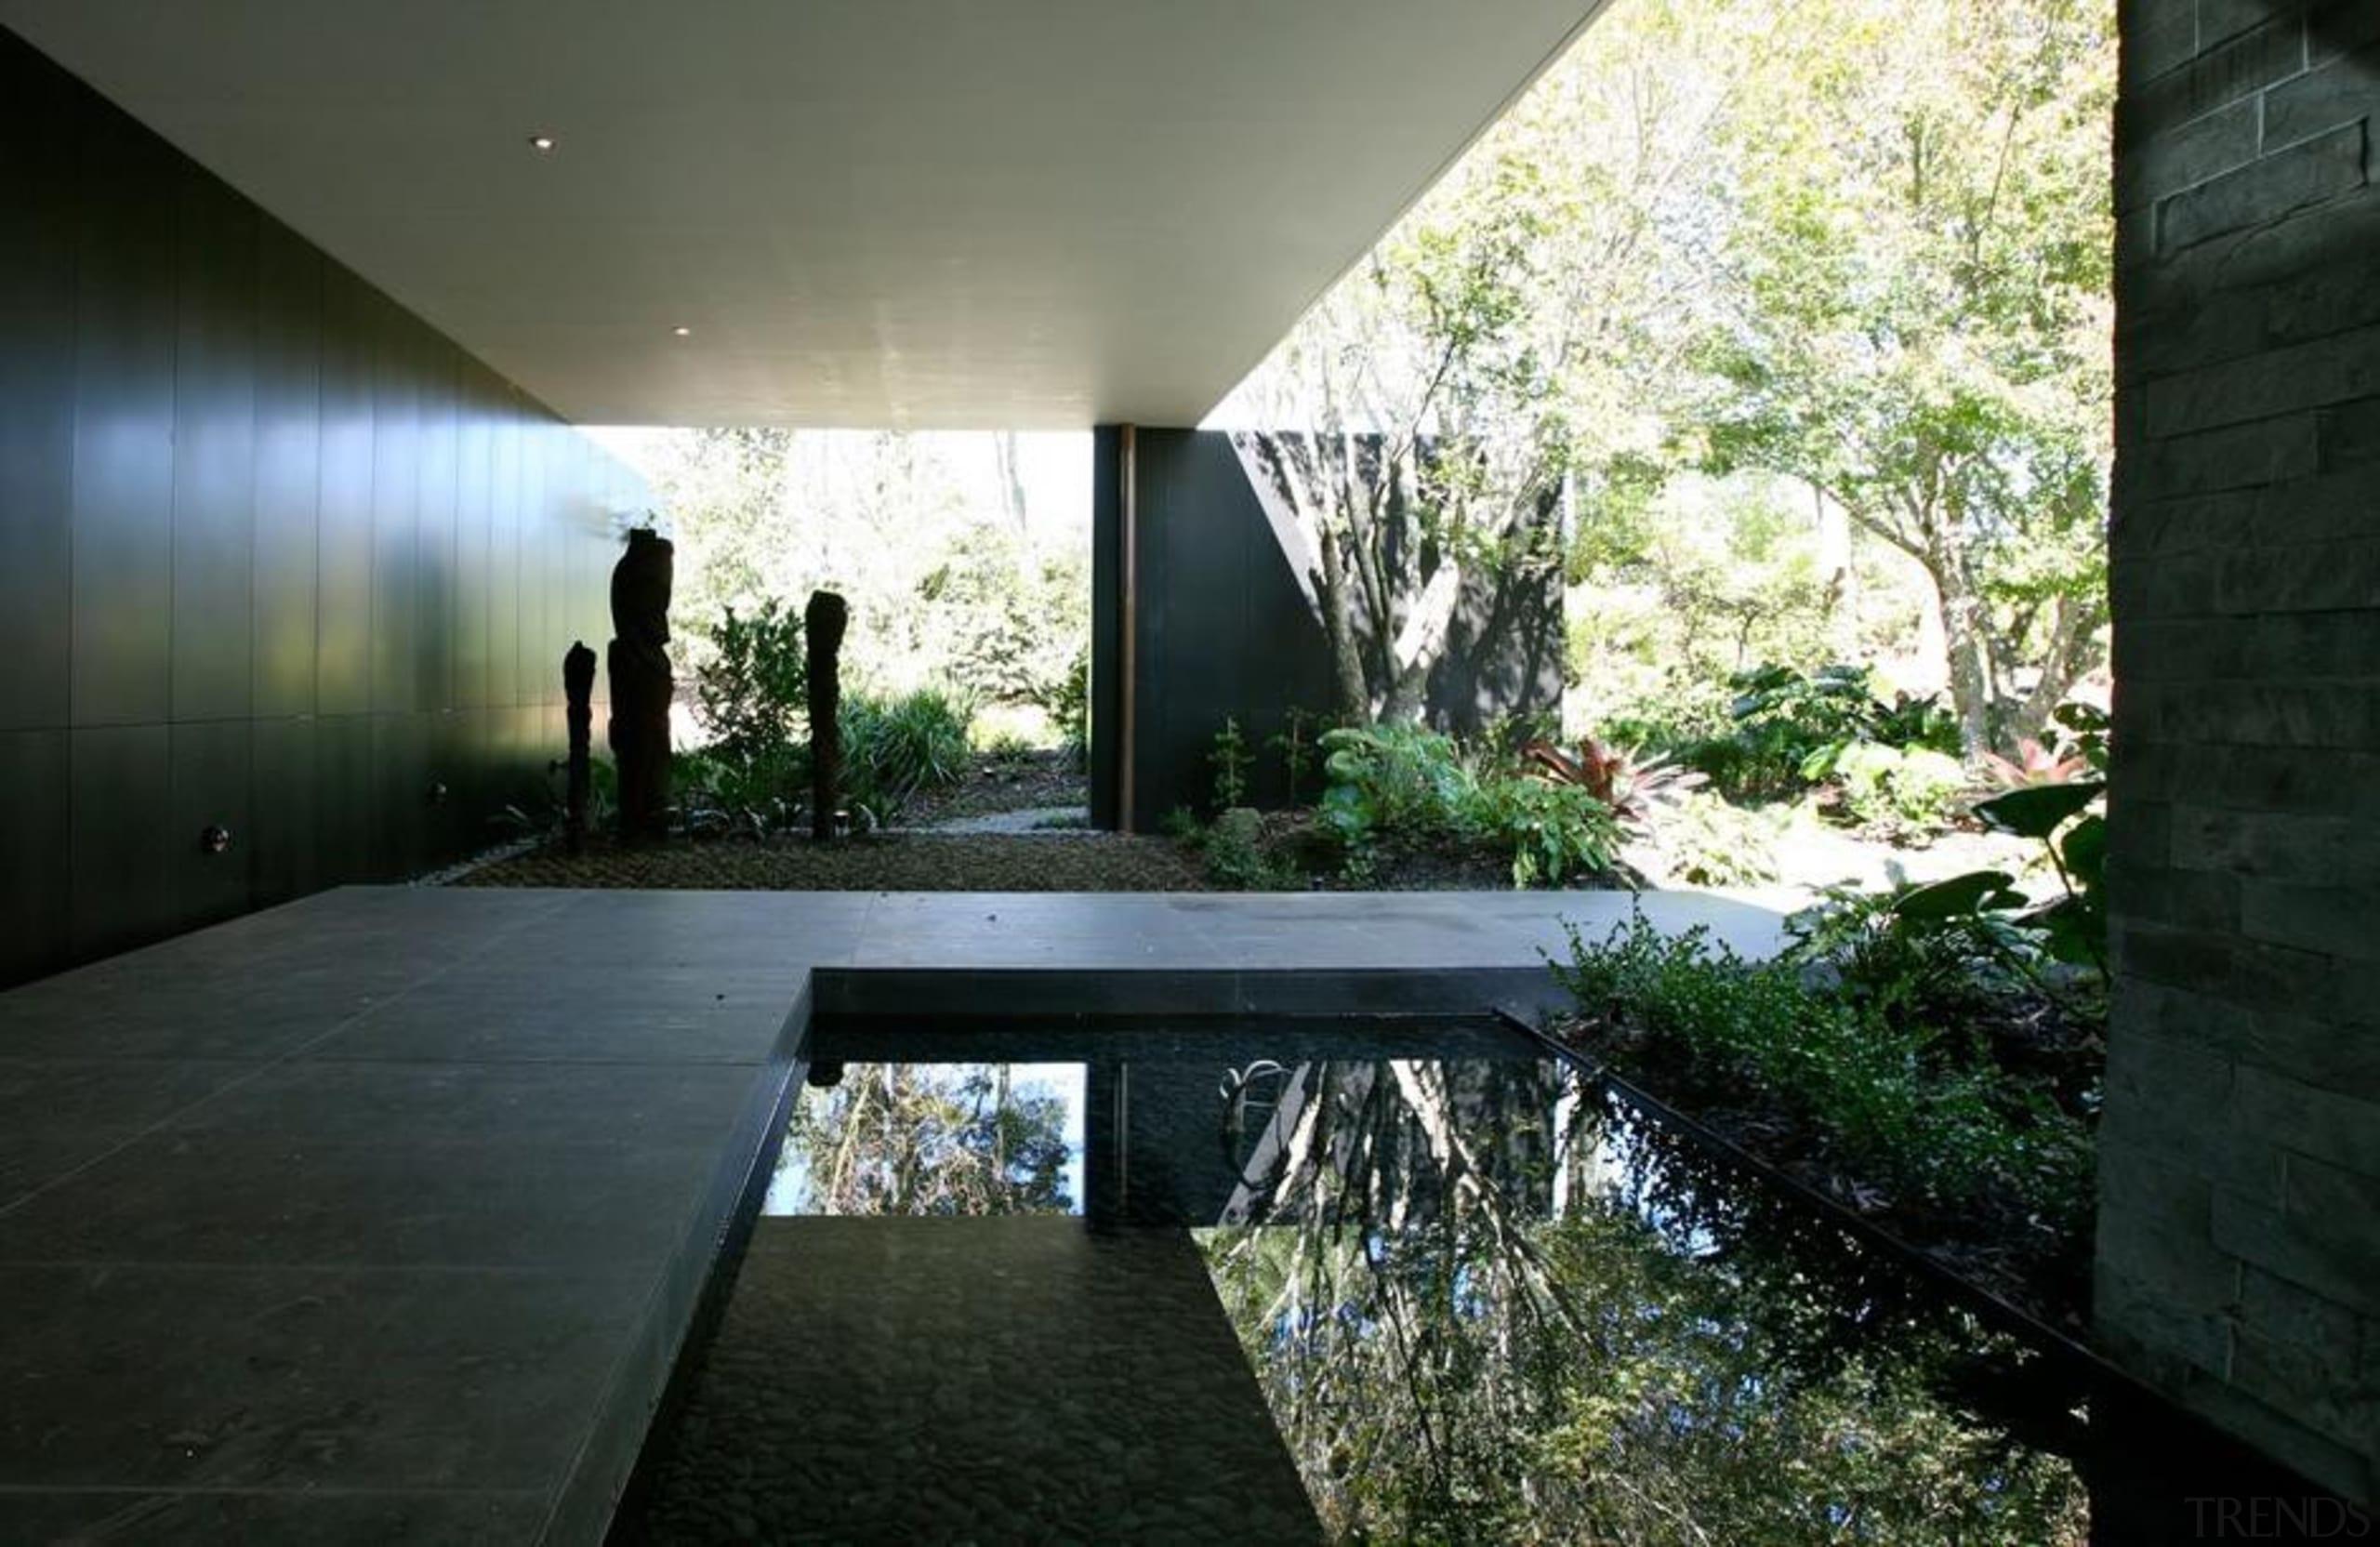 Coatesville House - Coatesville House - architecture | architecture, courtyard, estate, home, house, landscape, property, real estate, sunlight, black